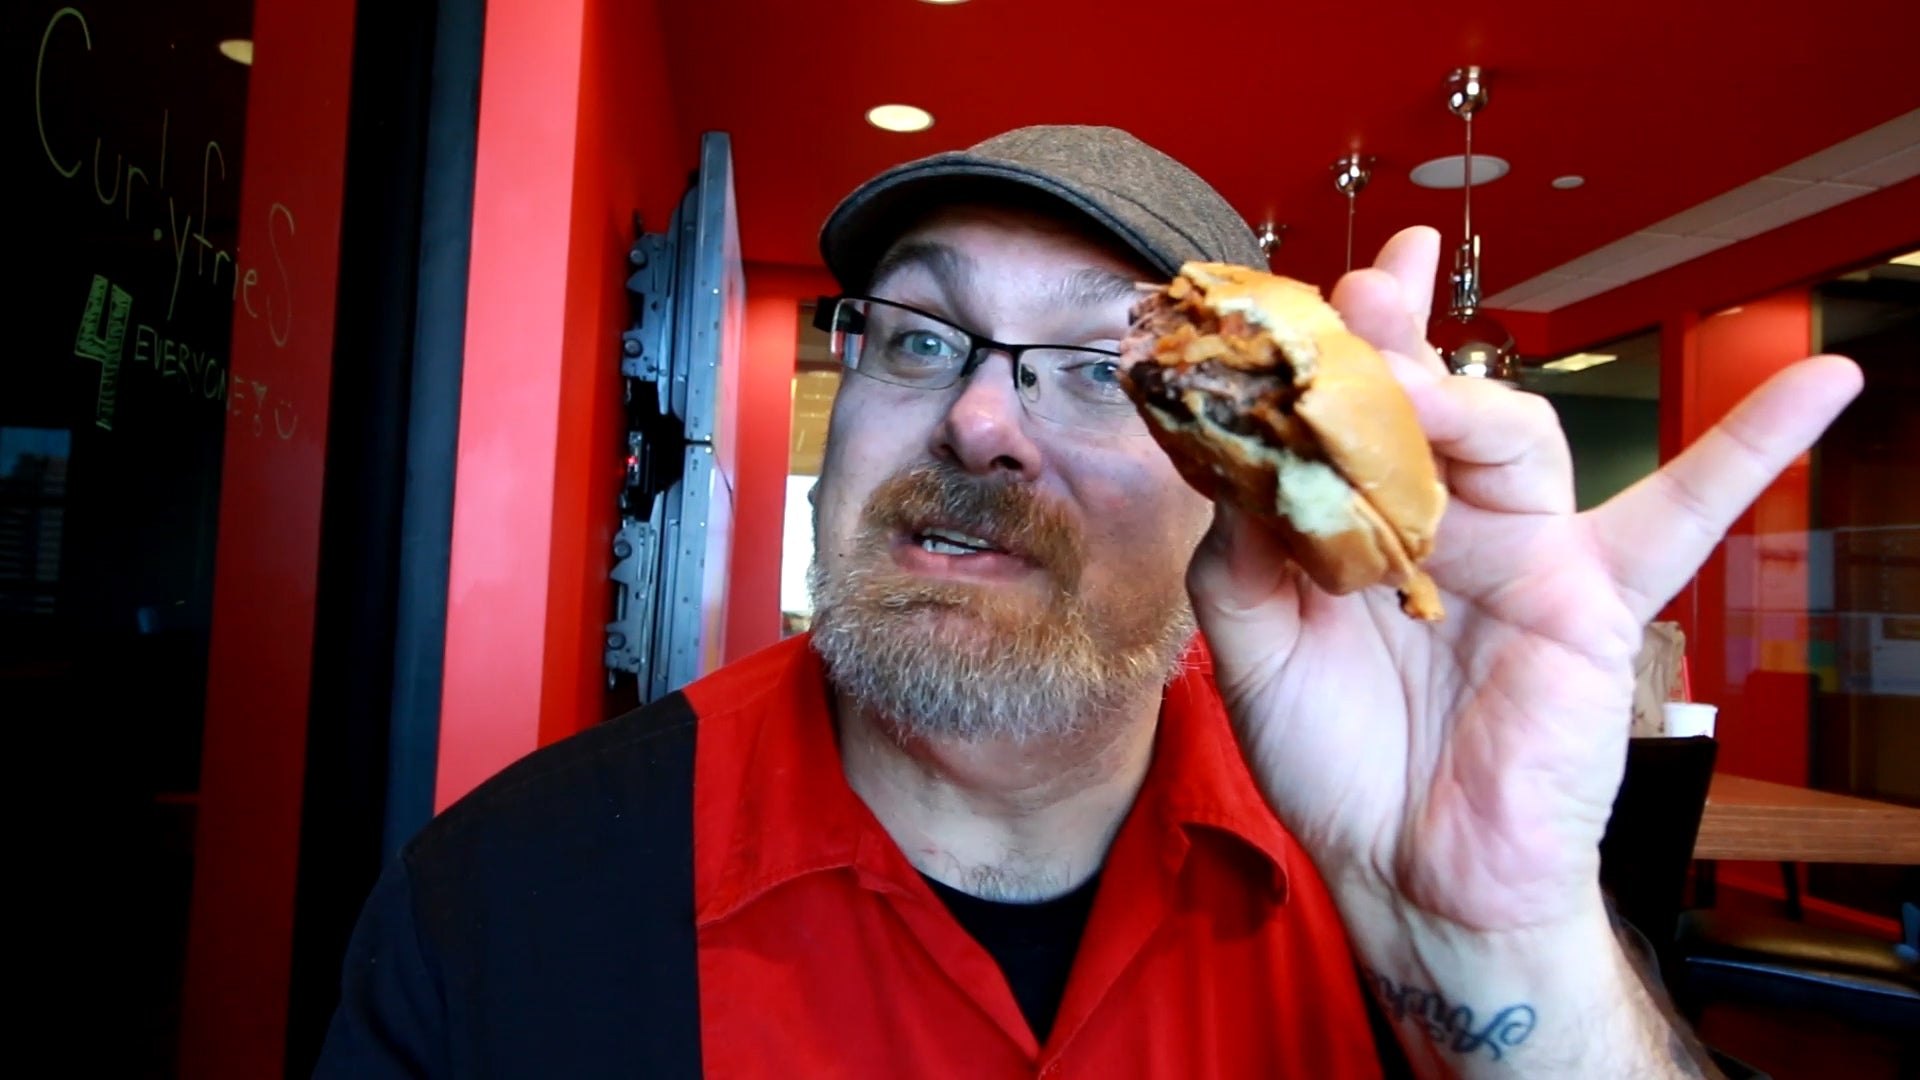 Snacktaku Eats A Venison Sandwich At Arby's HQ